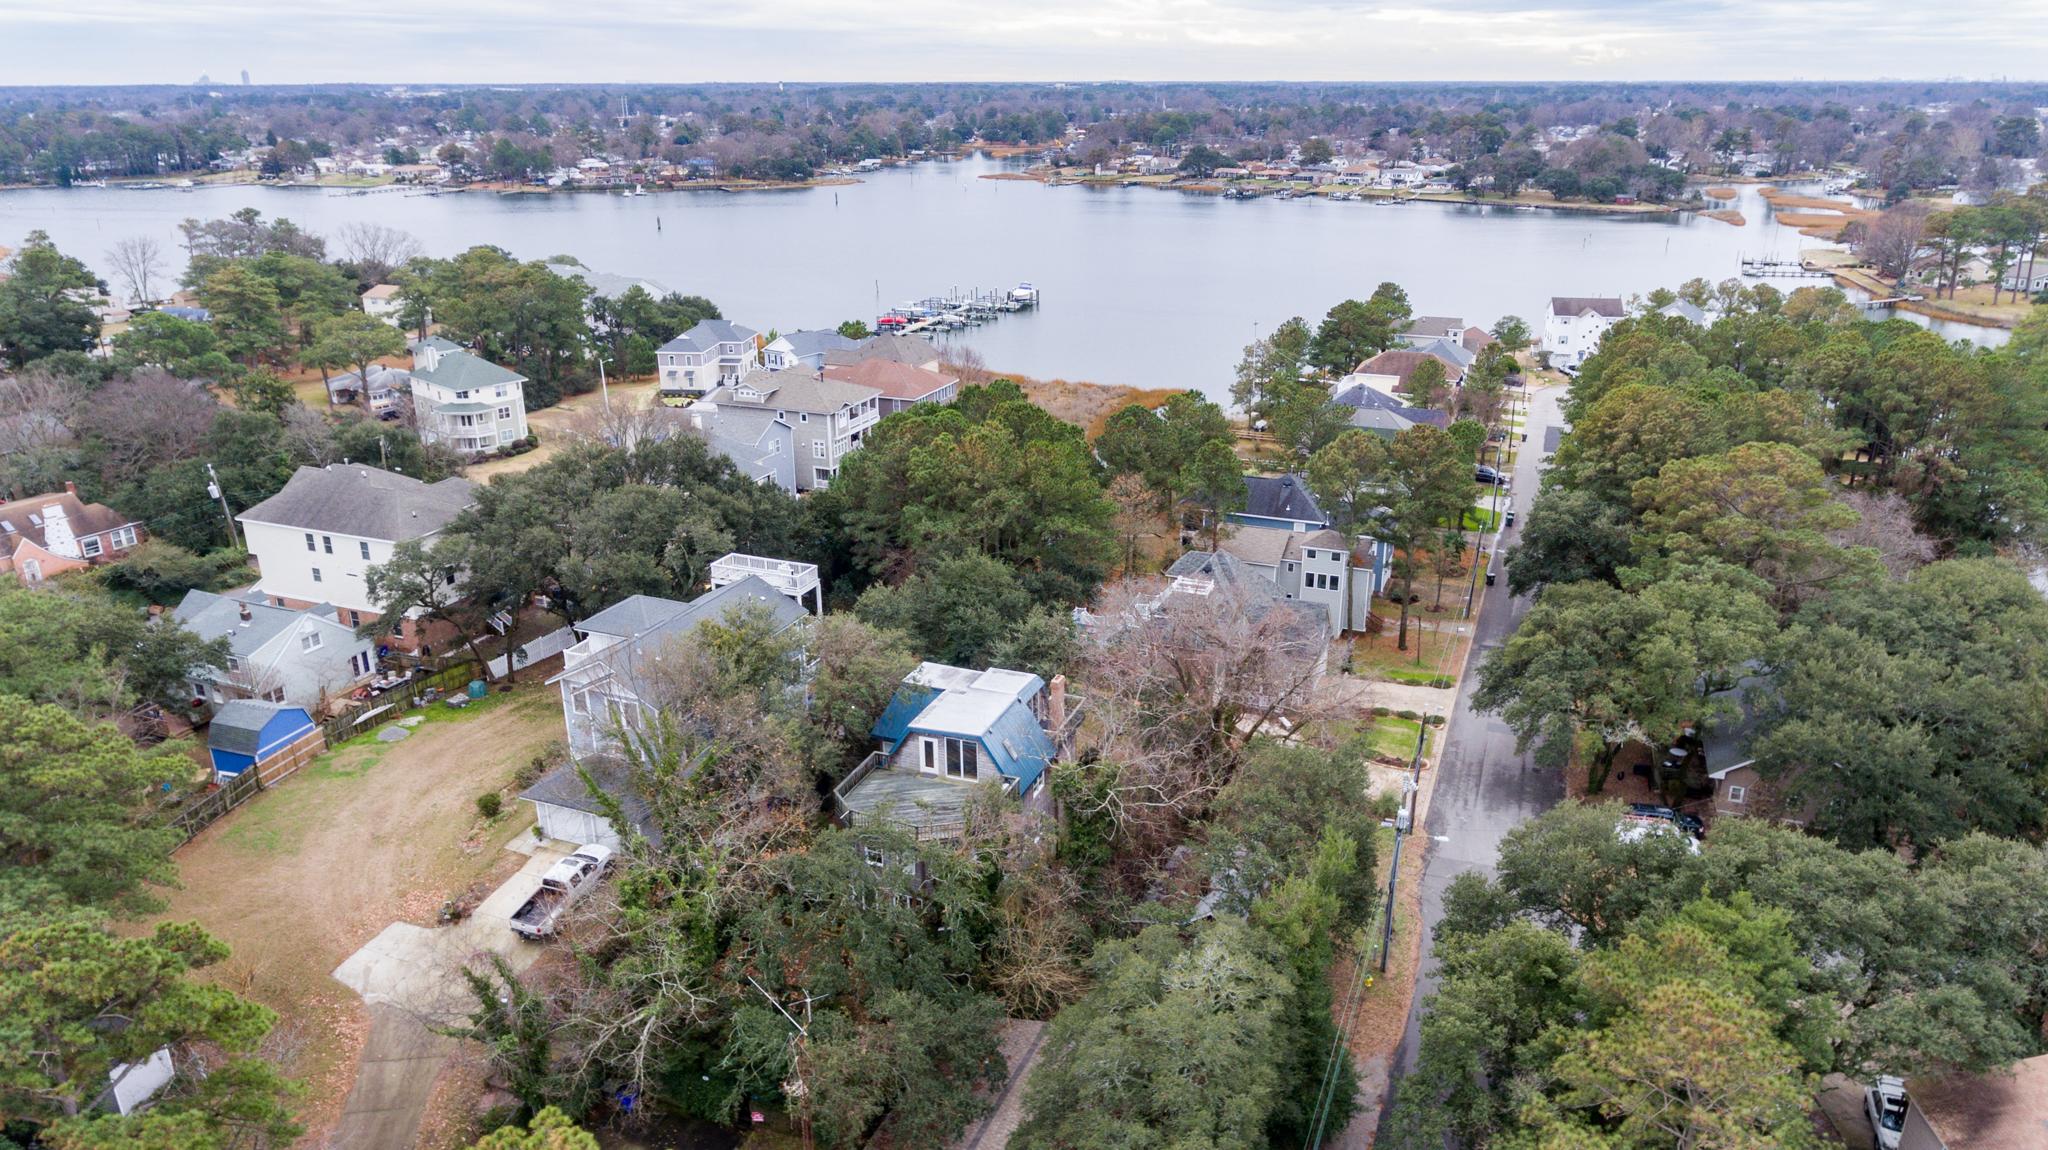 Newport News Aerial Drone Photo